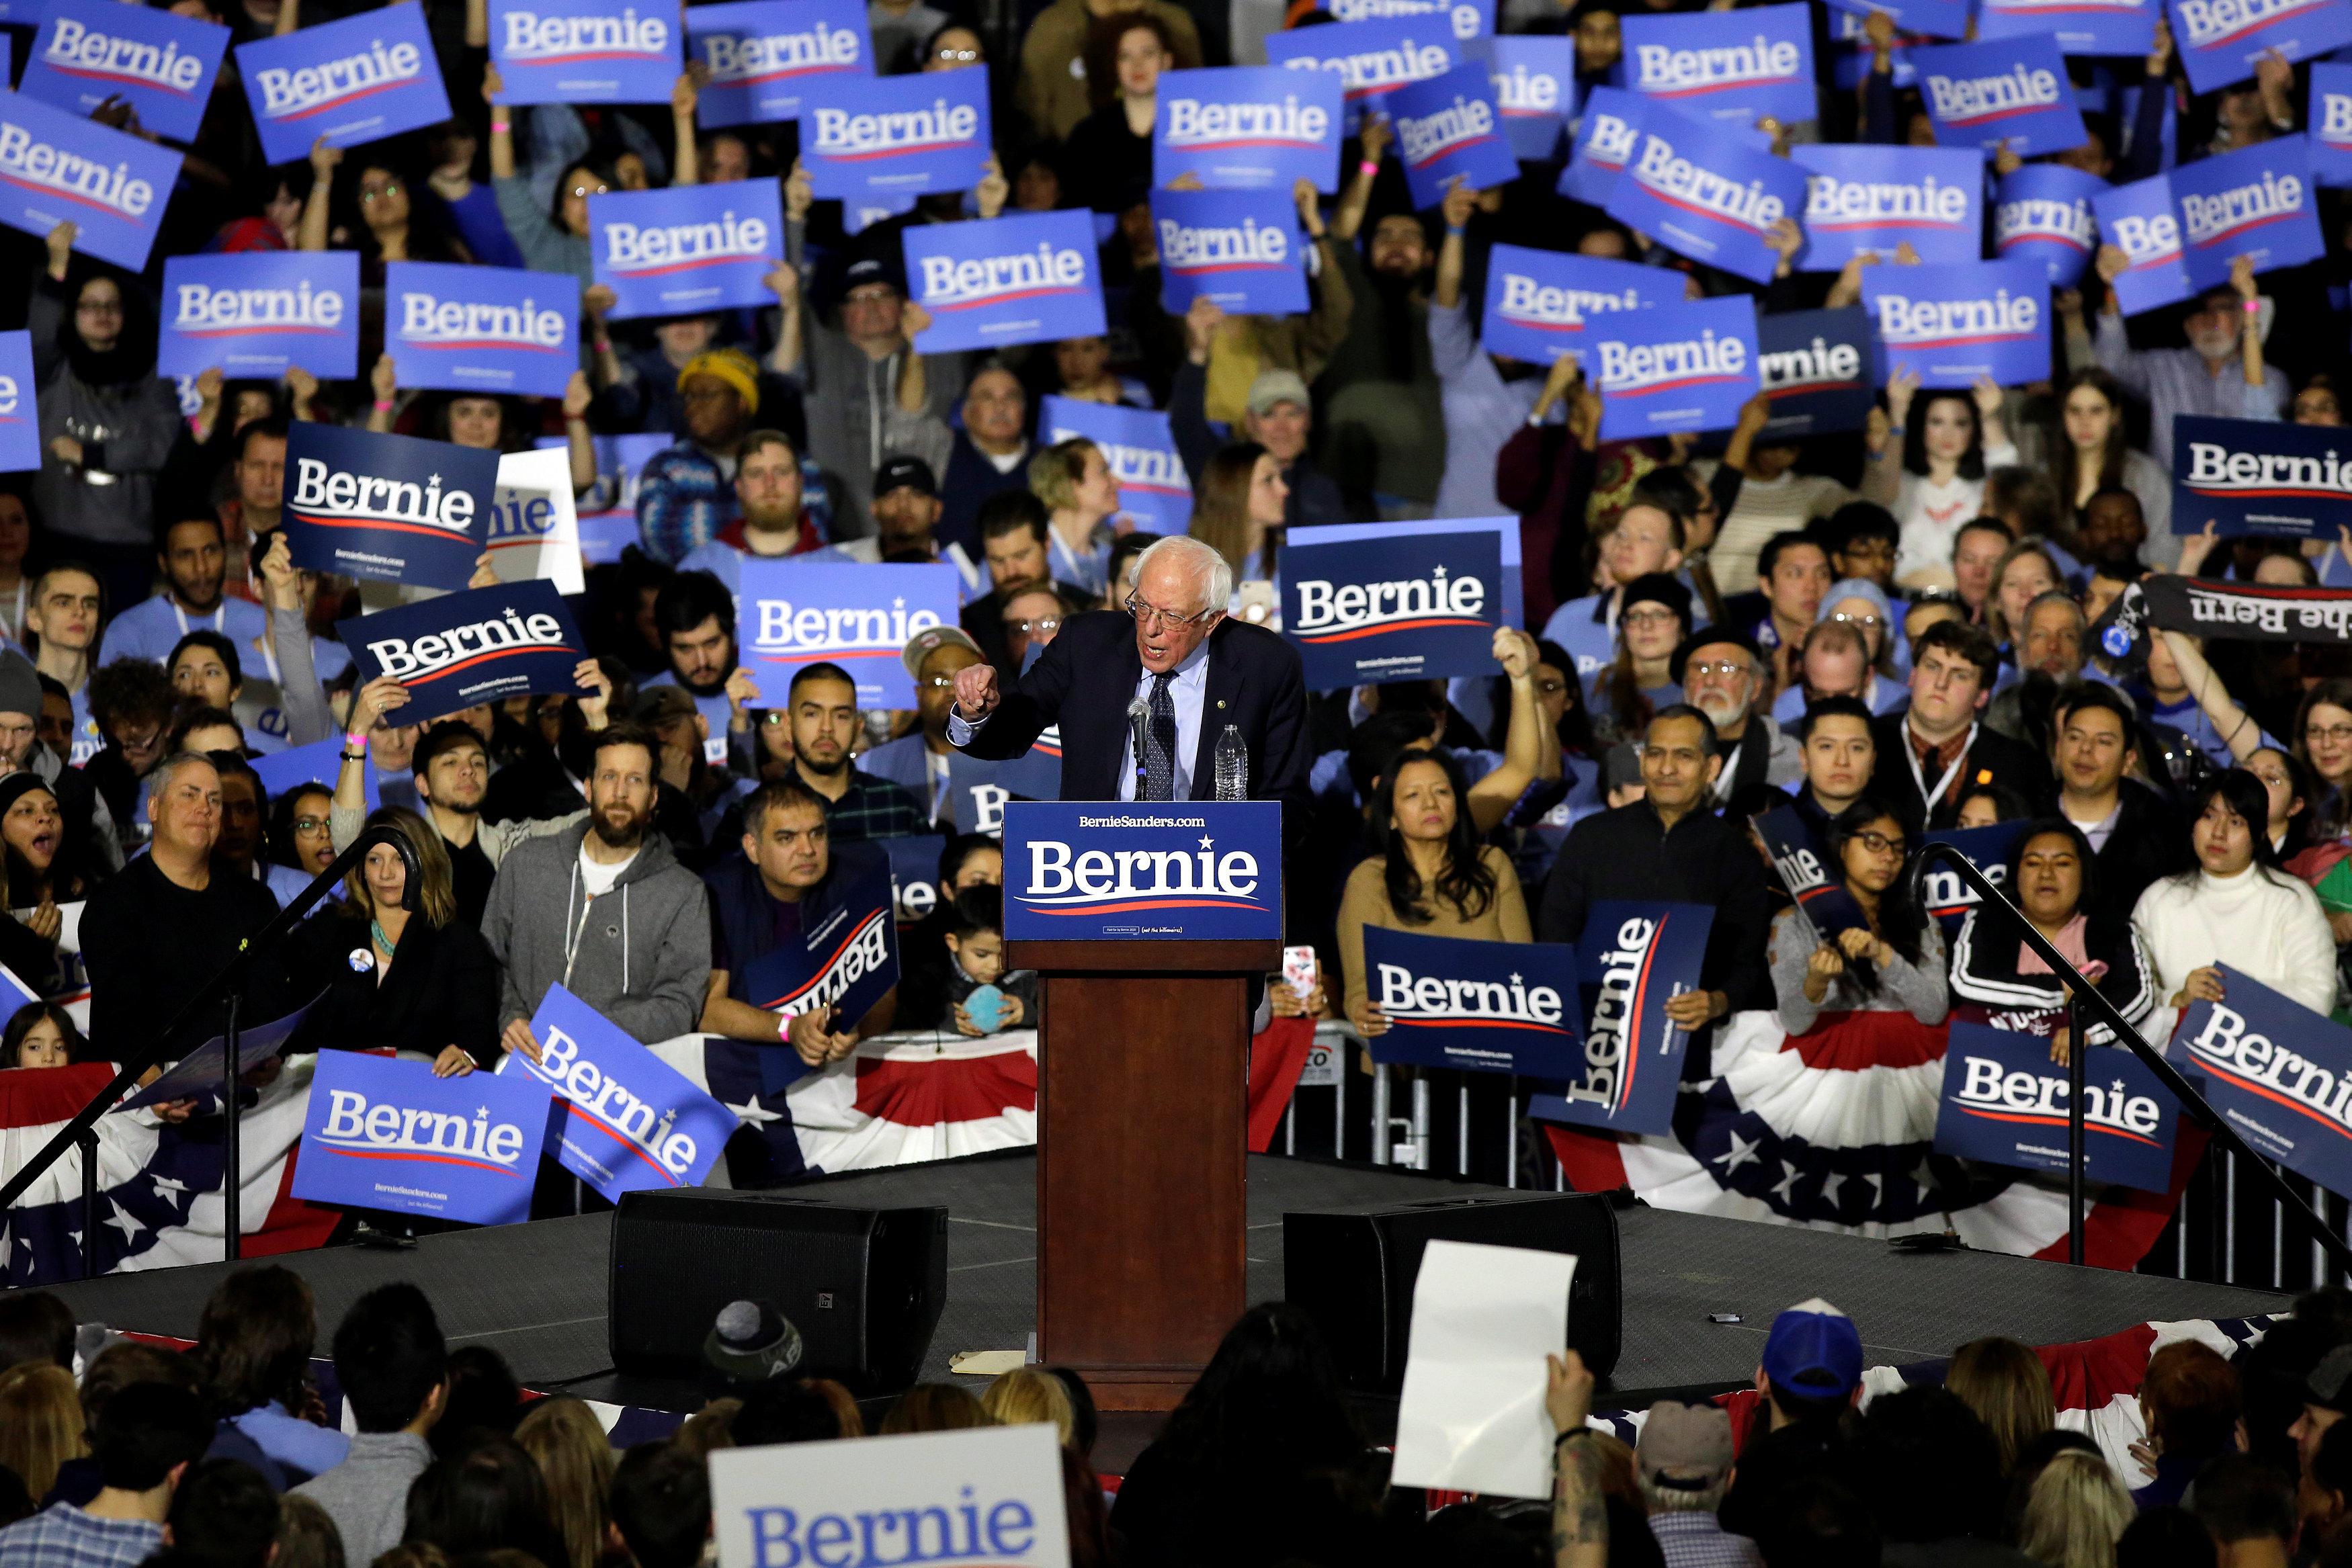 Sen. Bernie Sanders, I-Vt., speaks at a rally in Chicago on Sunday. (Photo: Joshua Lott/Reuters)